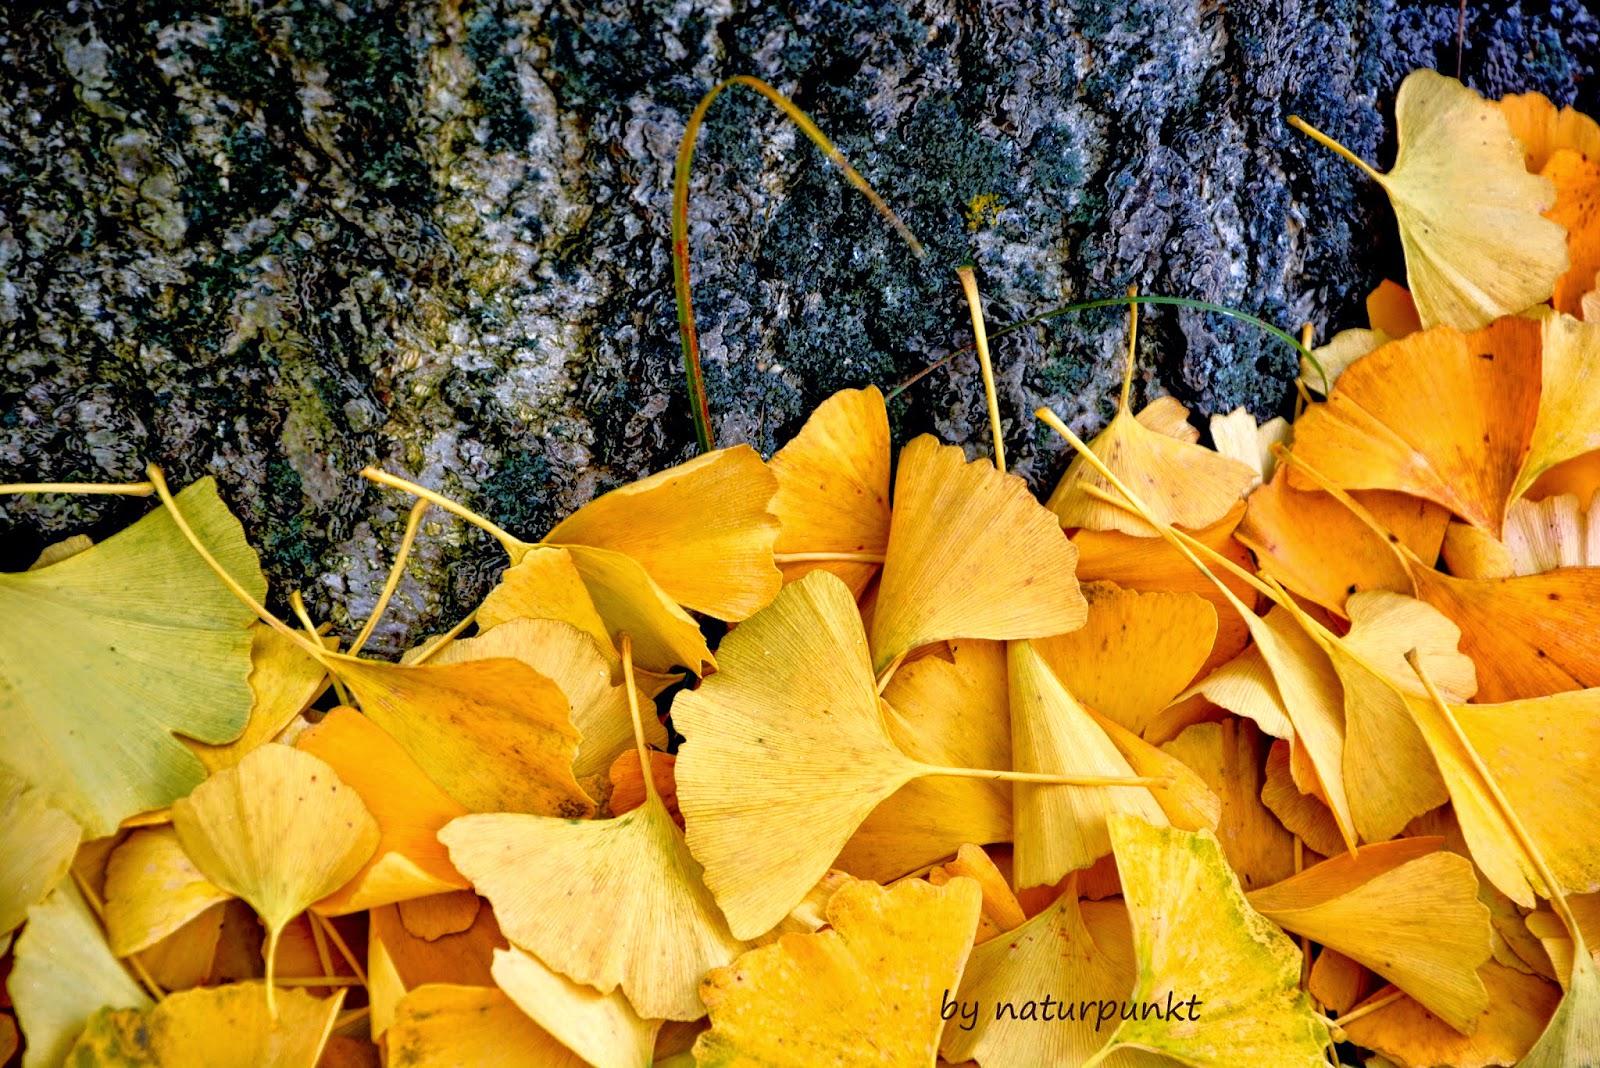 Naturpunkt Ginkgo Biloba Interesting Tree Wisdom And Poem